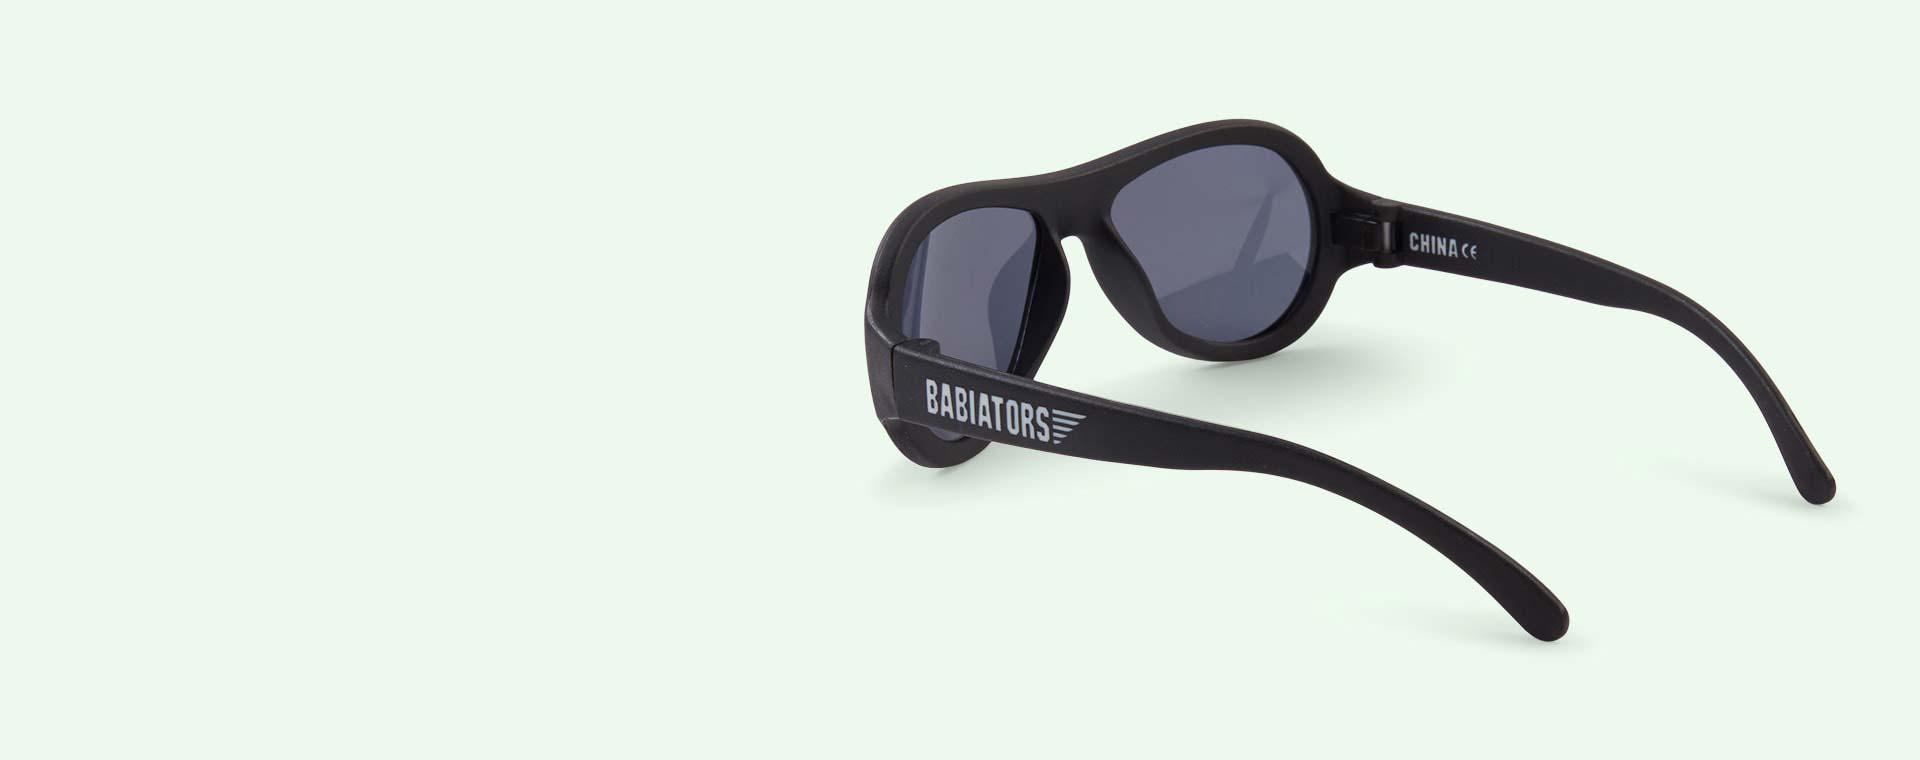 Buy The Babiators Original Aviators At Kidly True Blue Classic Ages 3 7 Sunglasses Black